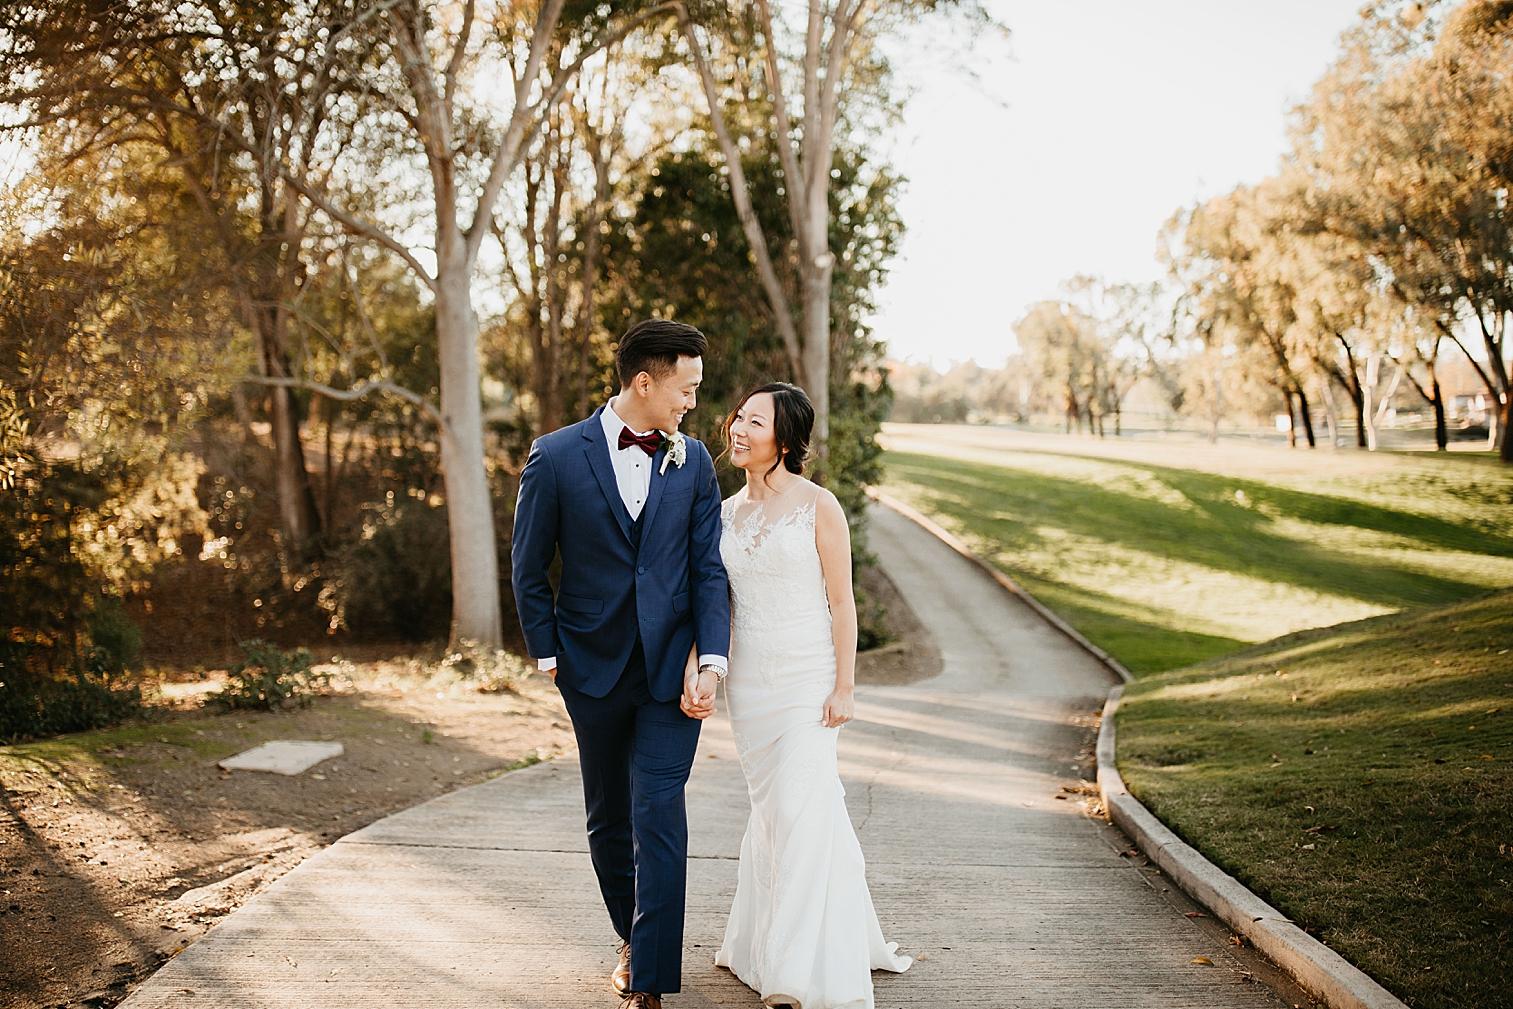 Secret-Garden-Rancho-Santa-Fe-Wedding-108.jpg